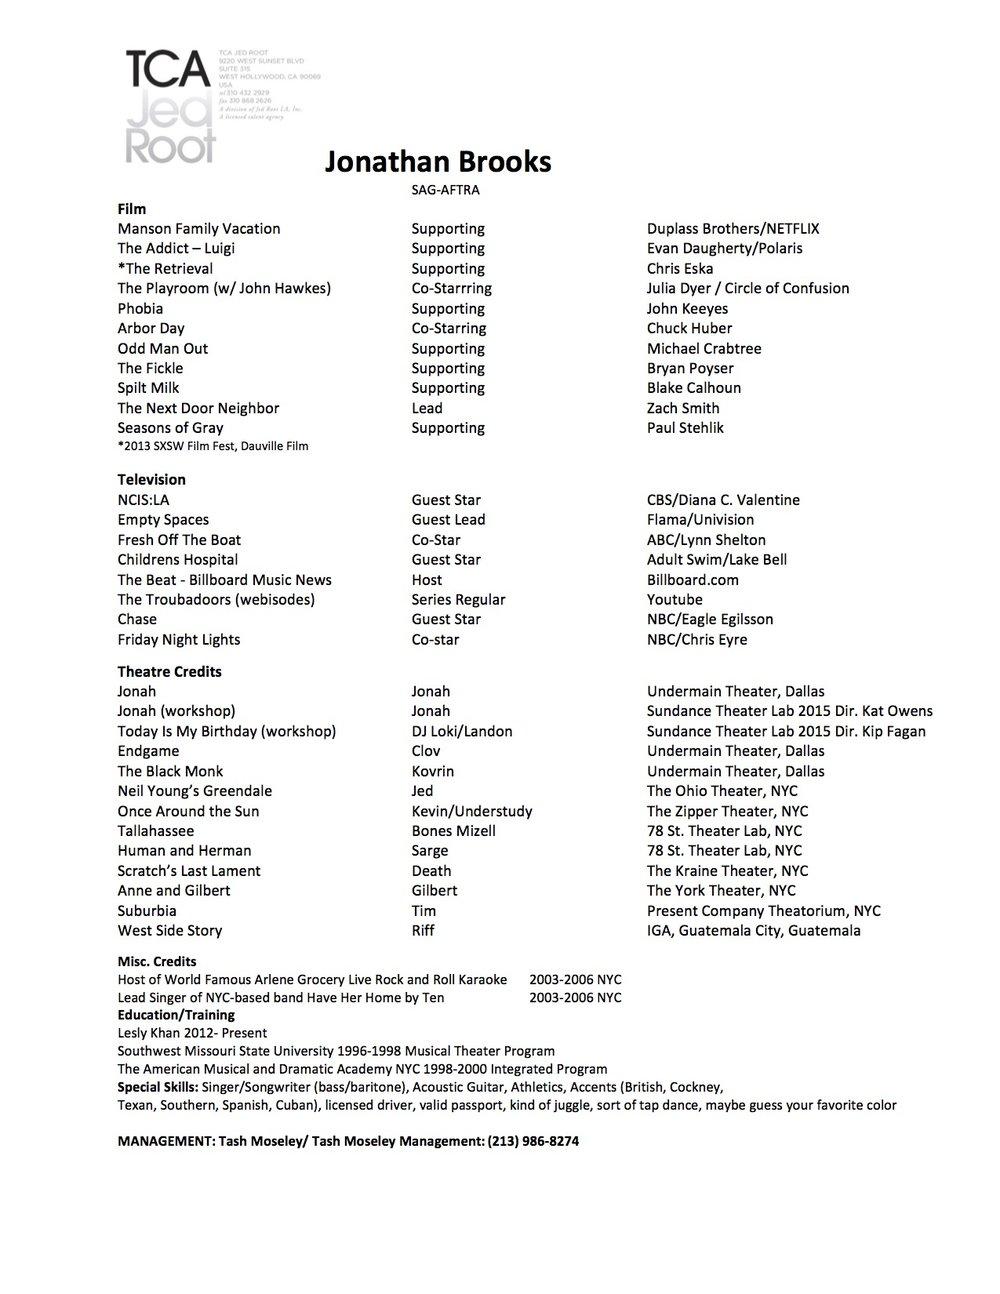 resume jonathan brooks jonathan brooks resume 7 26 15 jpg